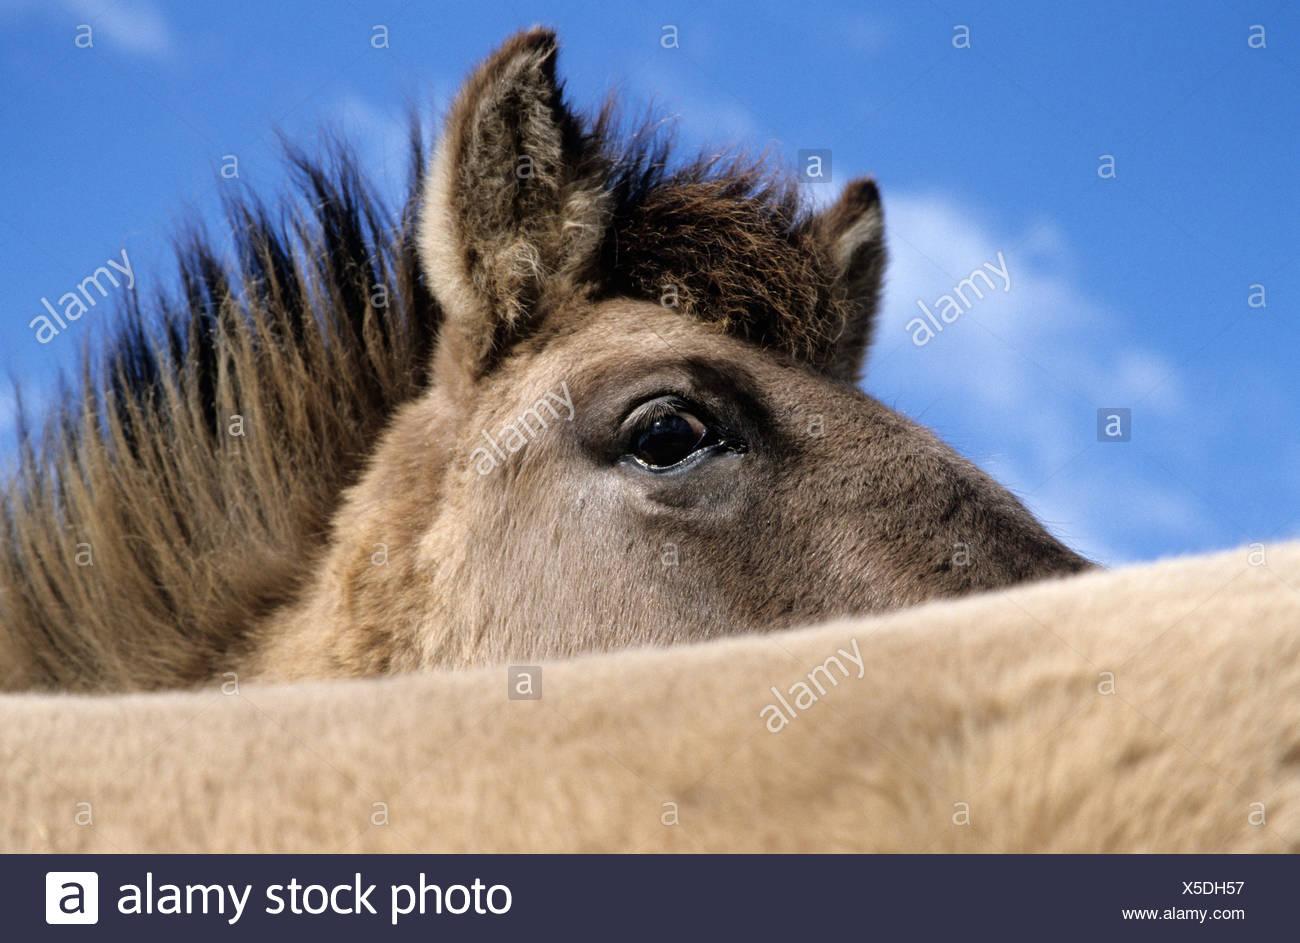 konik, stallion tarpan, equus ferus gmelini - Stock Image